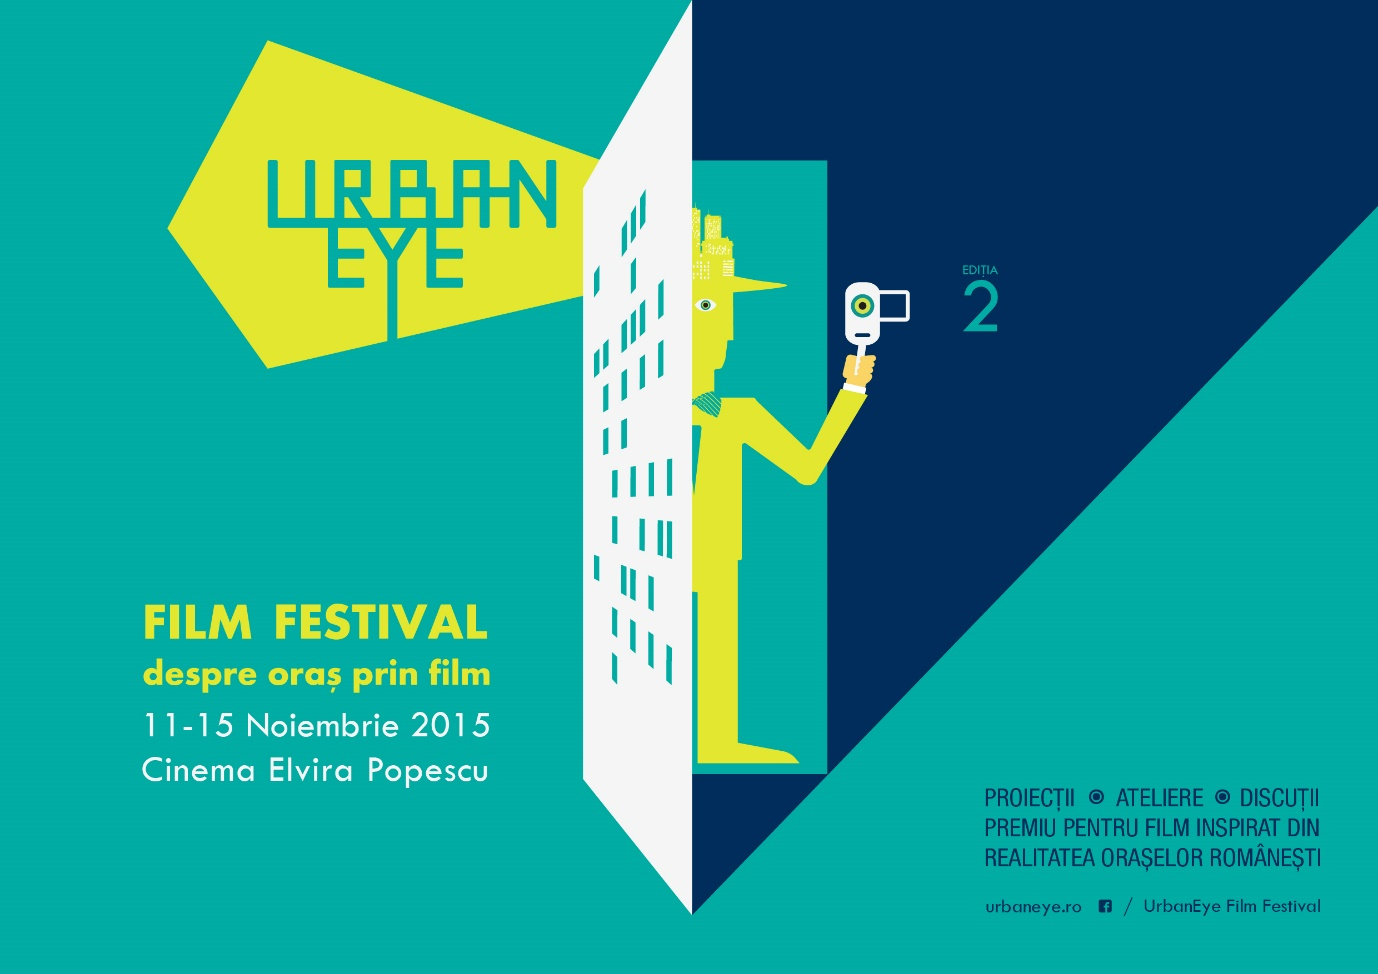 UrbanEye Film Festival editia a 2-a despre oras prin film - UrbanEye Film Festival editia a